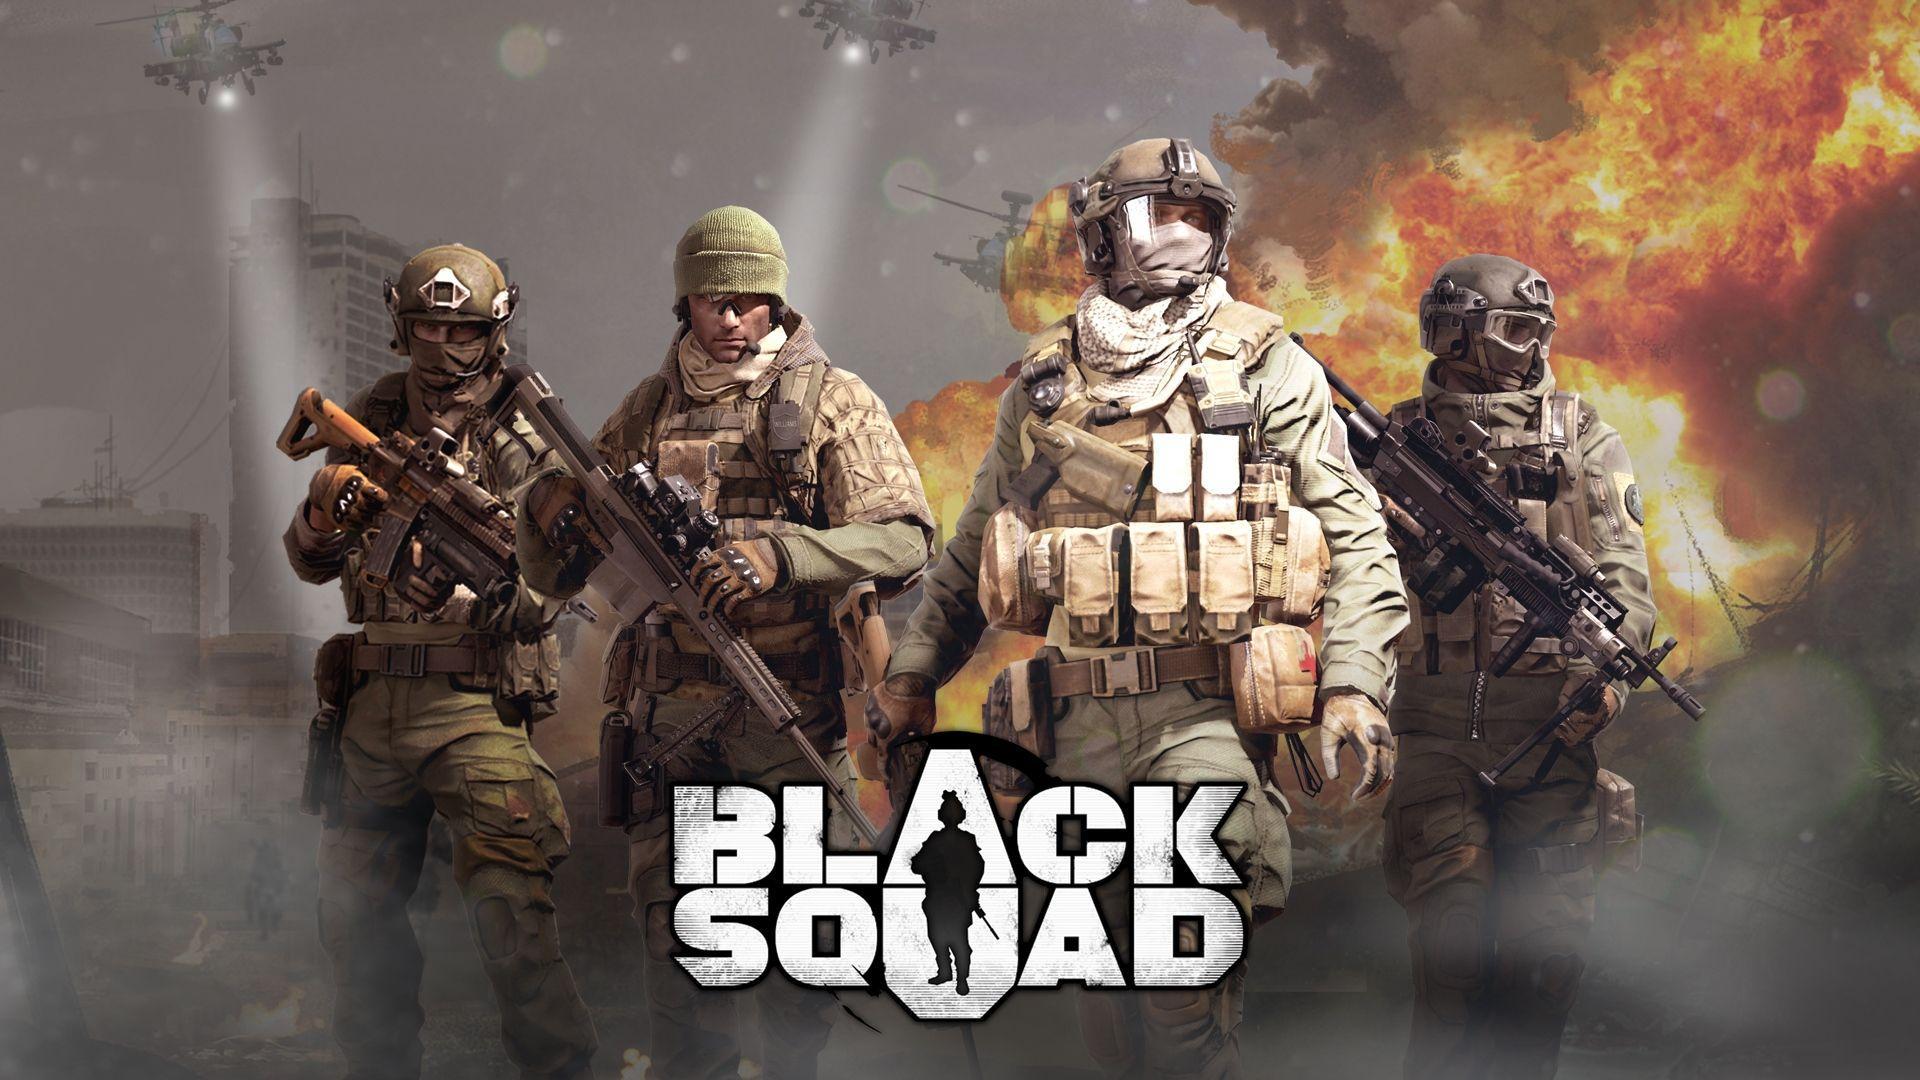 Pubg Squad Hd Wallpaper: Black Squad Wallpapers